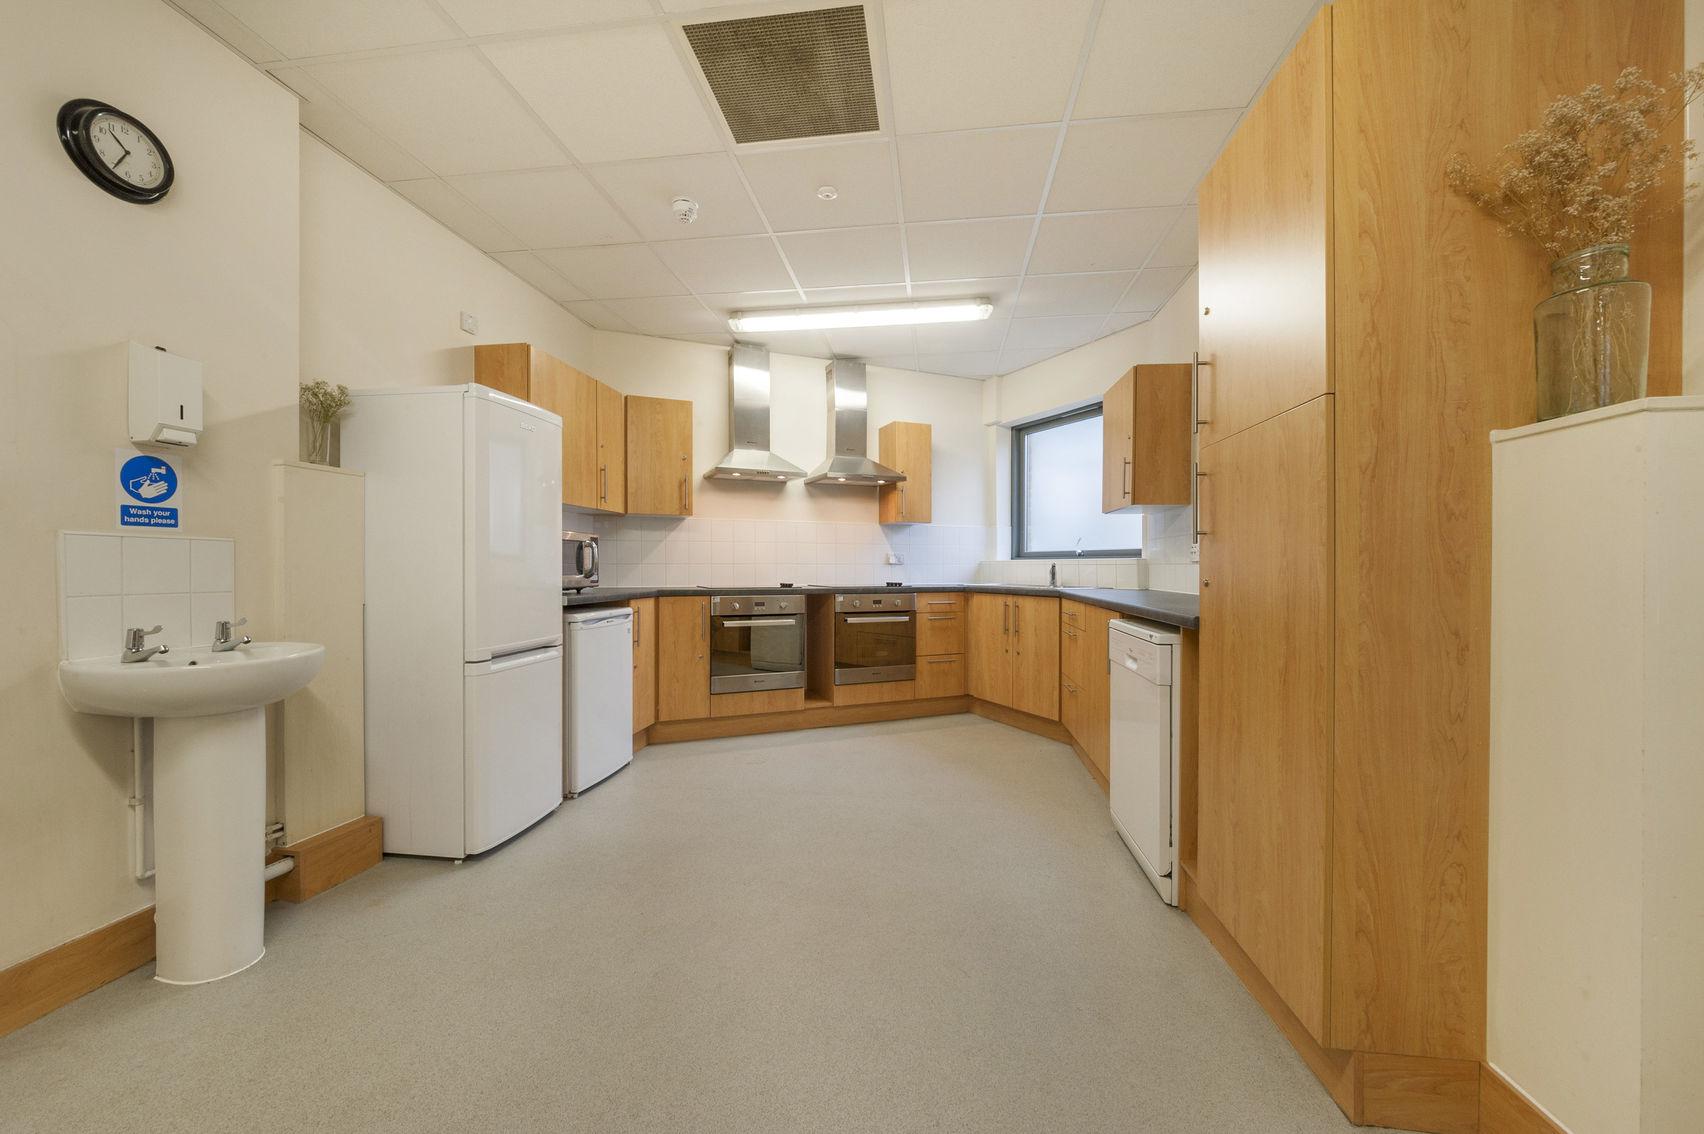 Kitchen, The Arc Centre